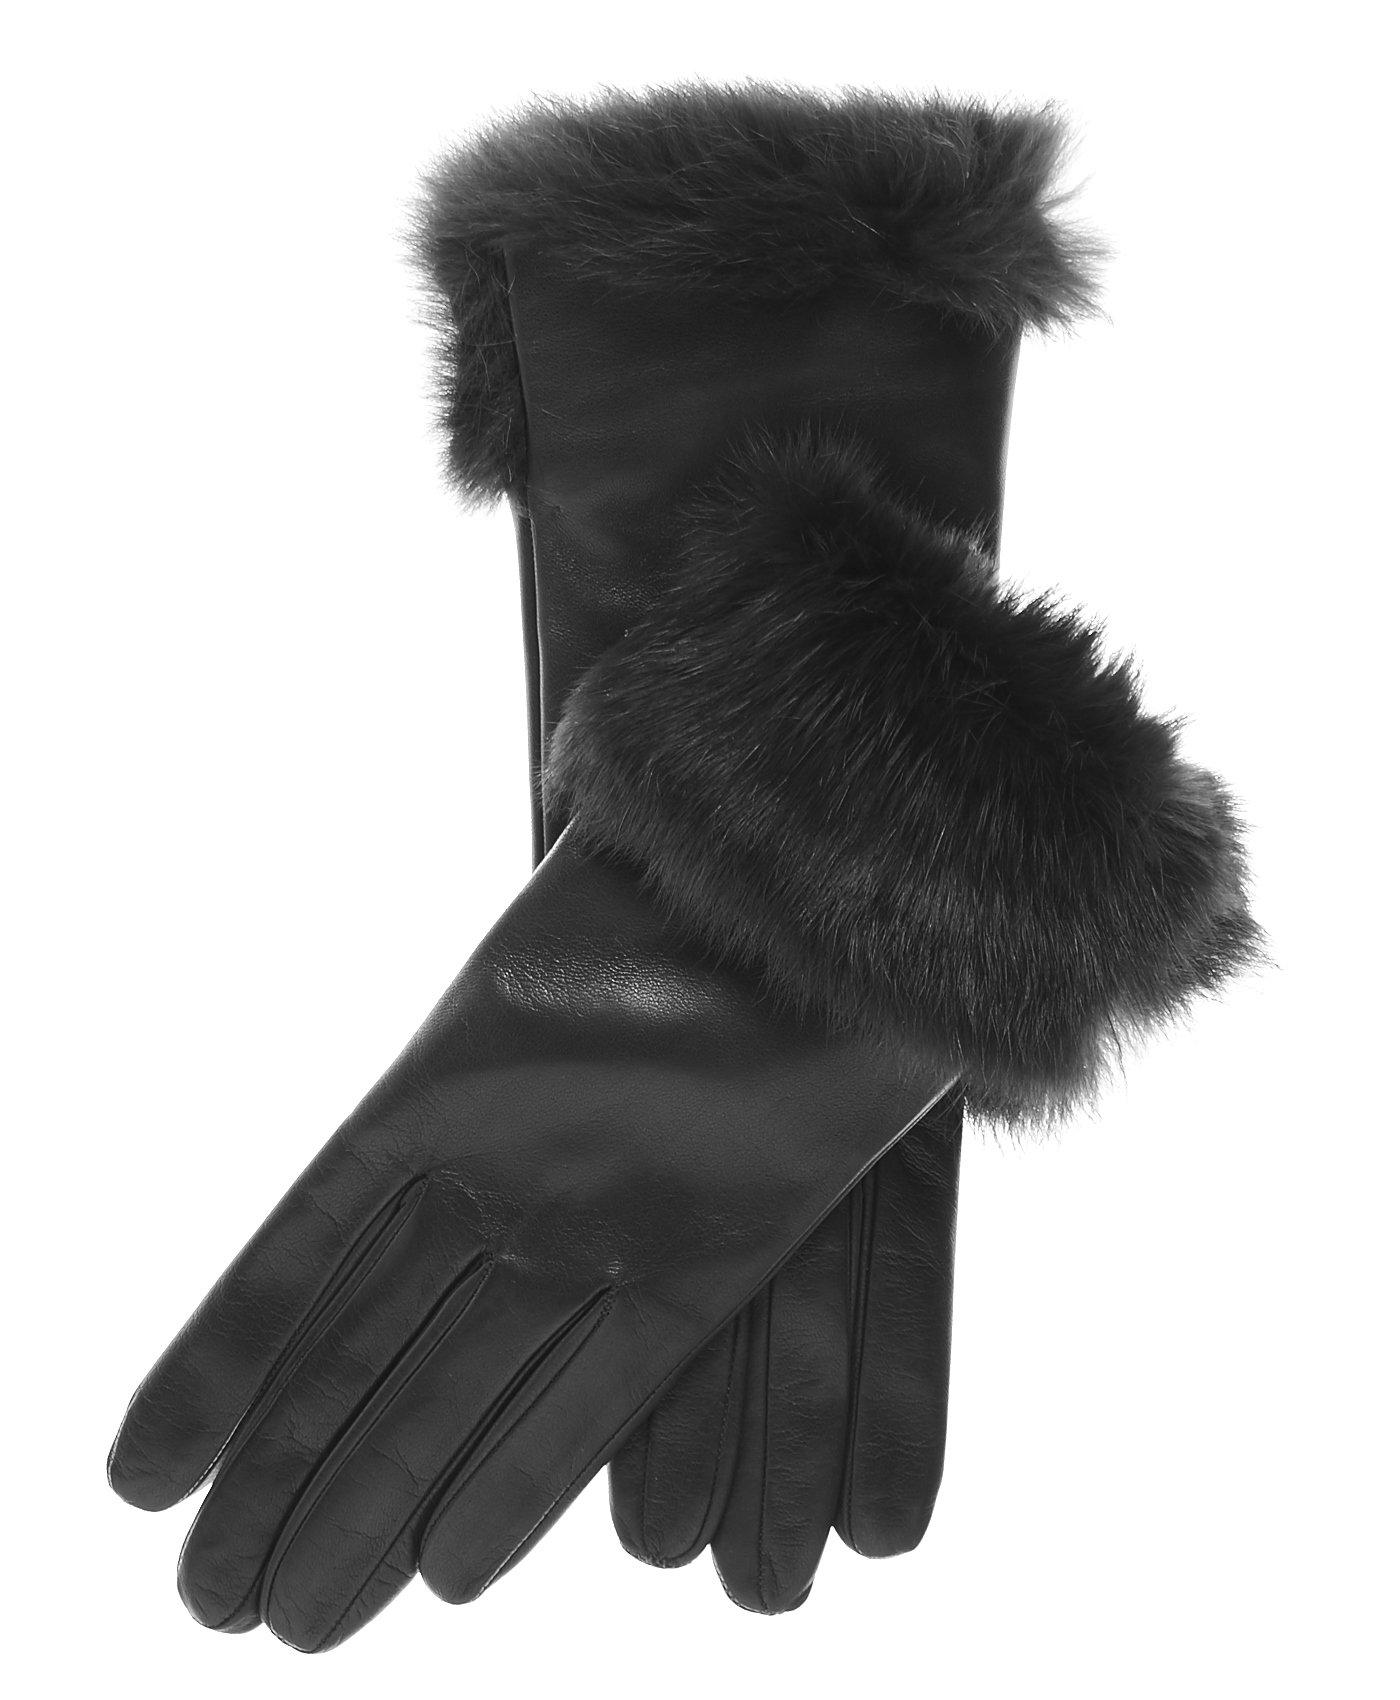 Fratelli Orsini Women's Italian Rabbit Fur Cuff Winter Leather Gloves Size 8 Color Black